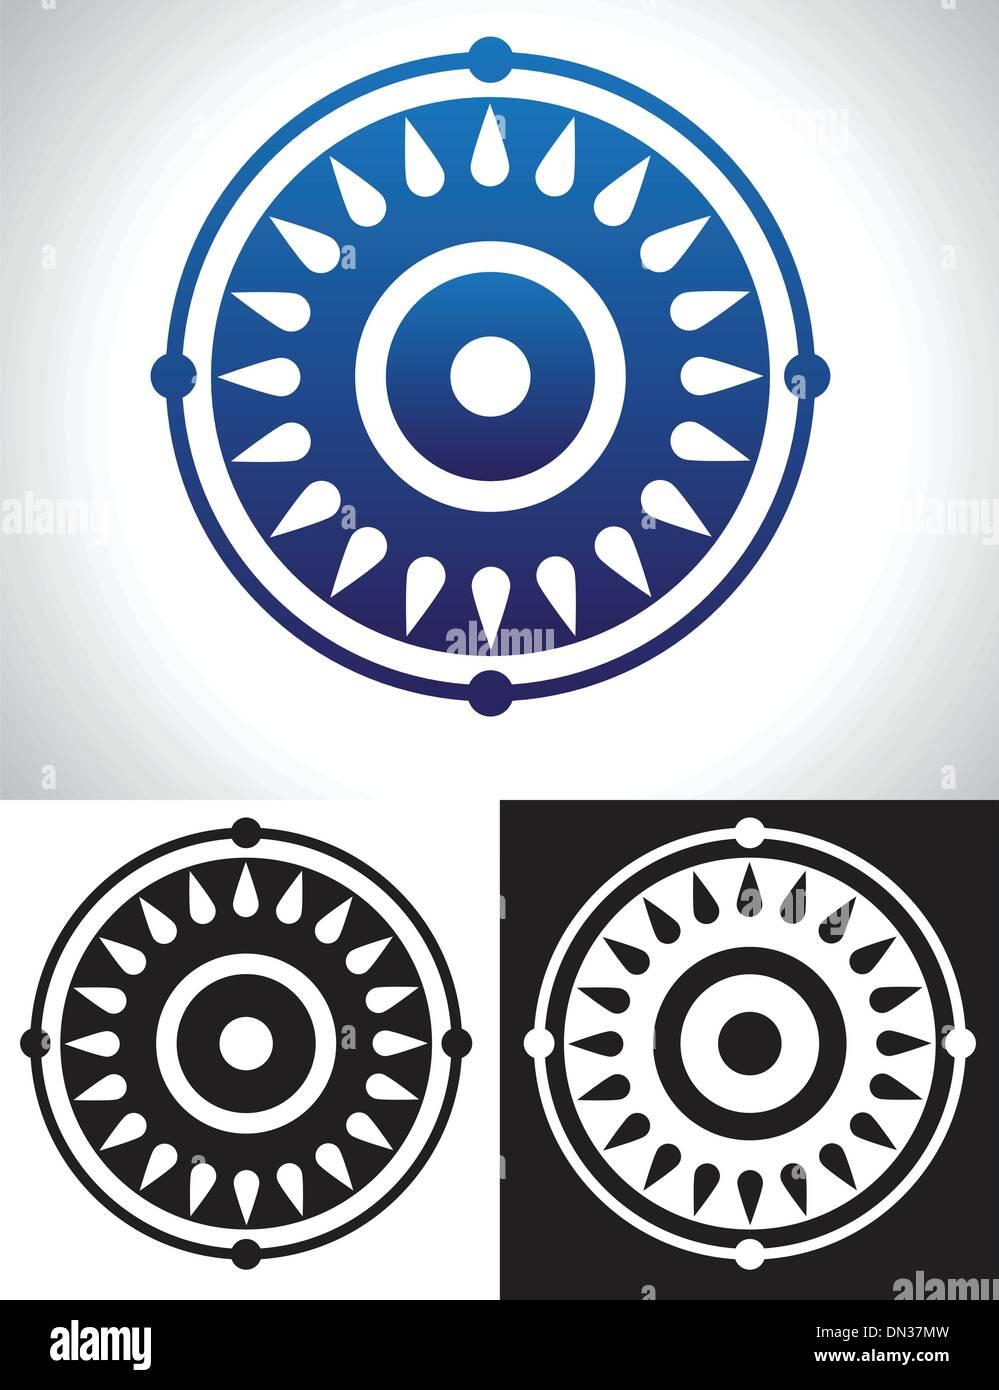 Mandala-Symbolik Stockbild